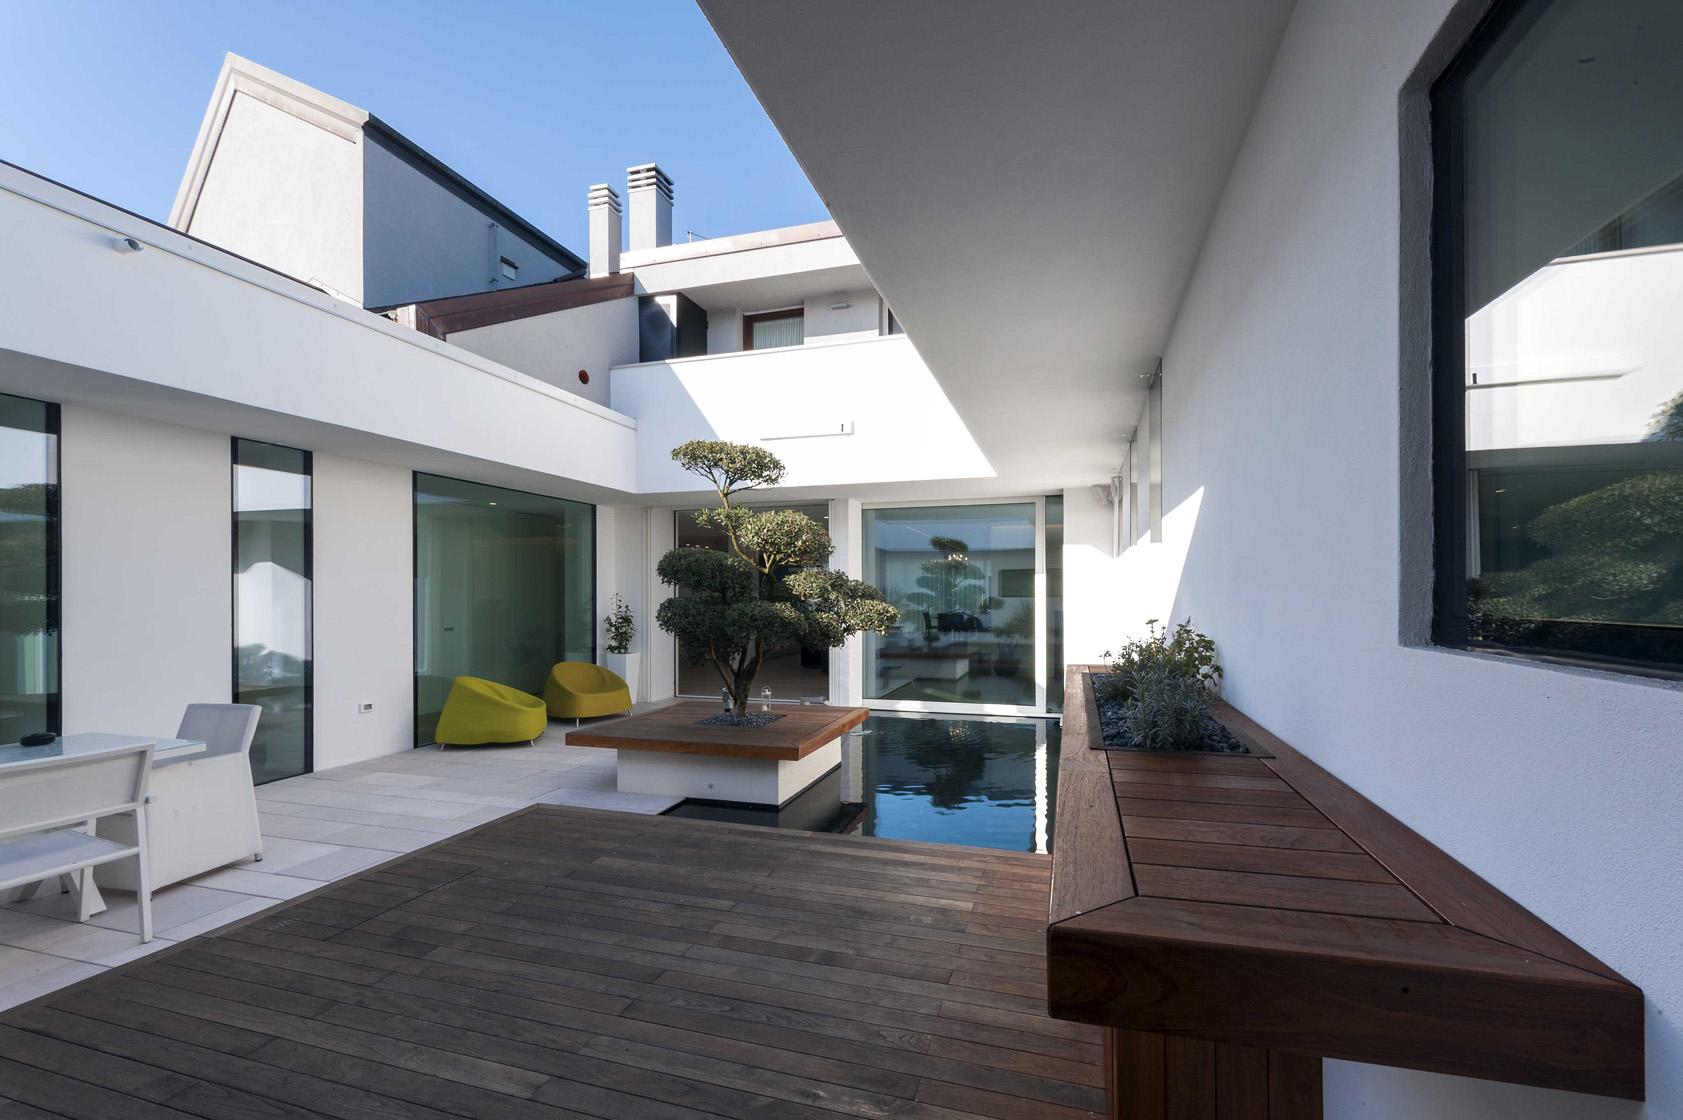 patio porto viro - 28 images - best il patio porto viro contemporary ...